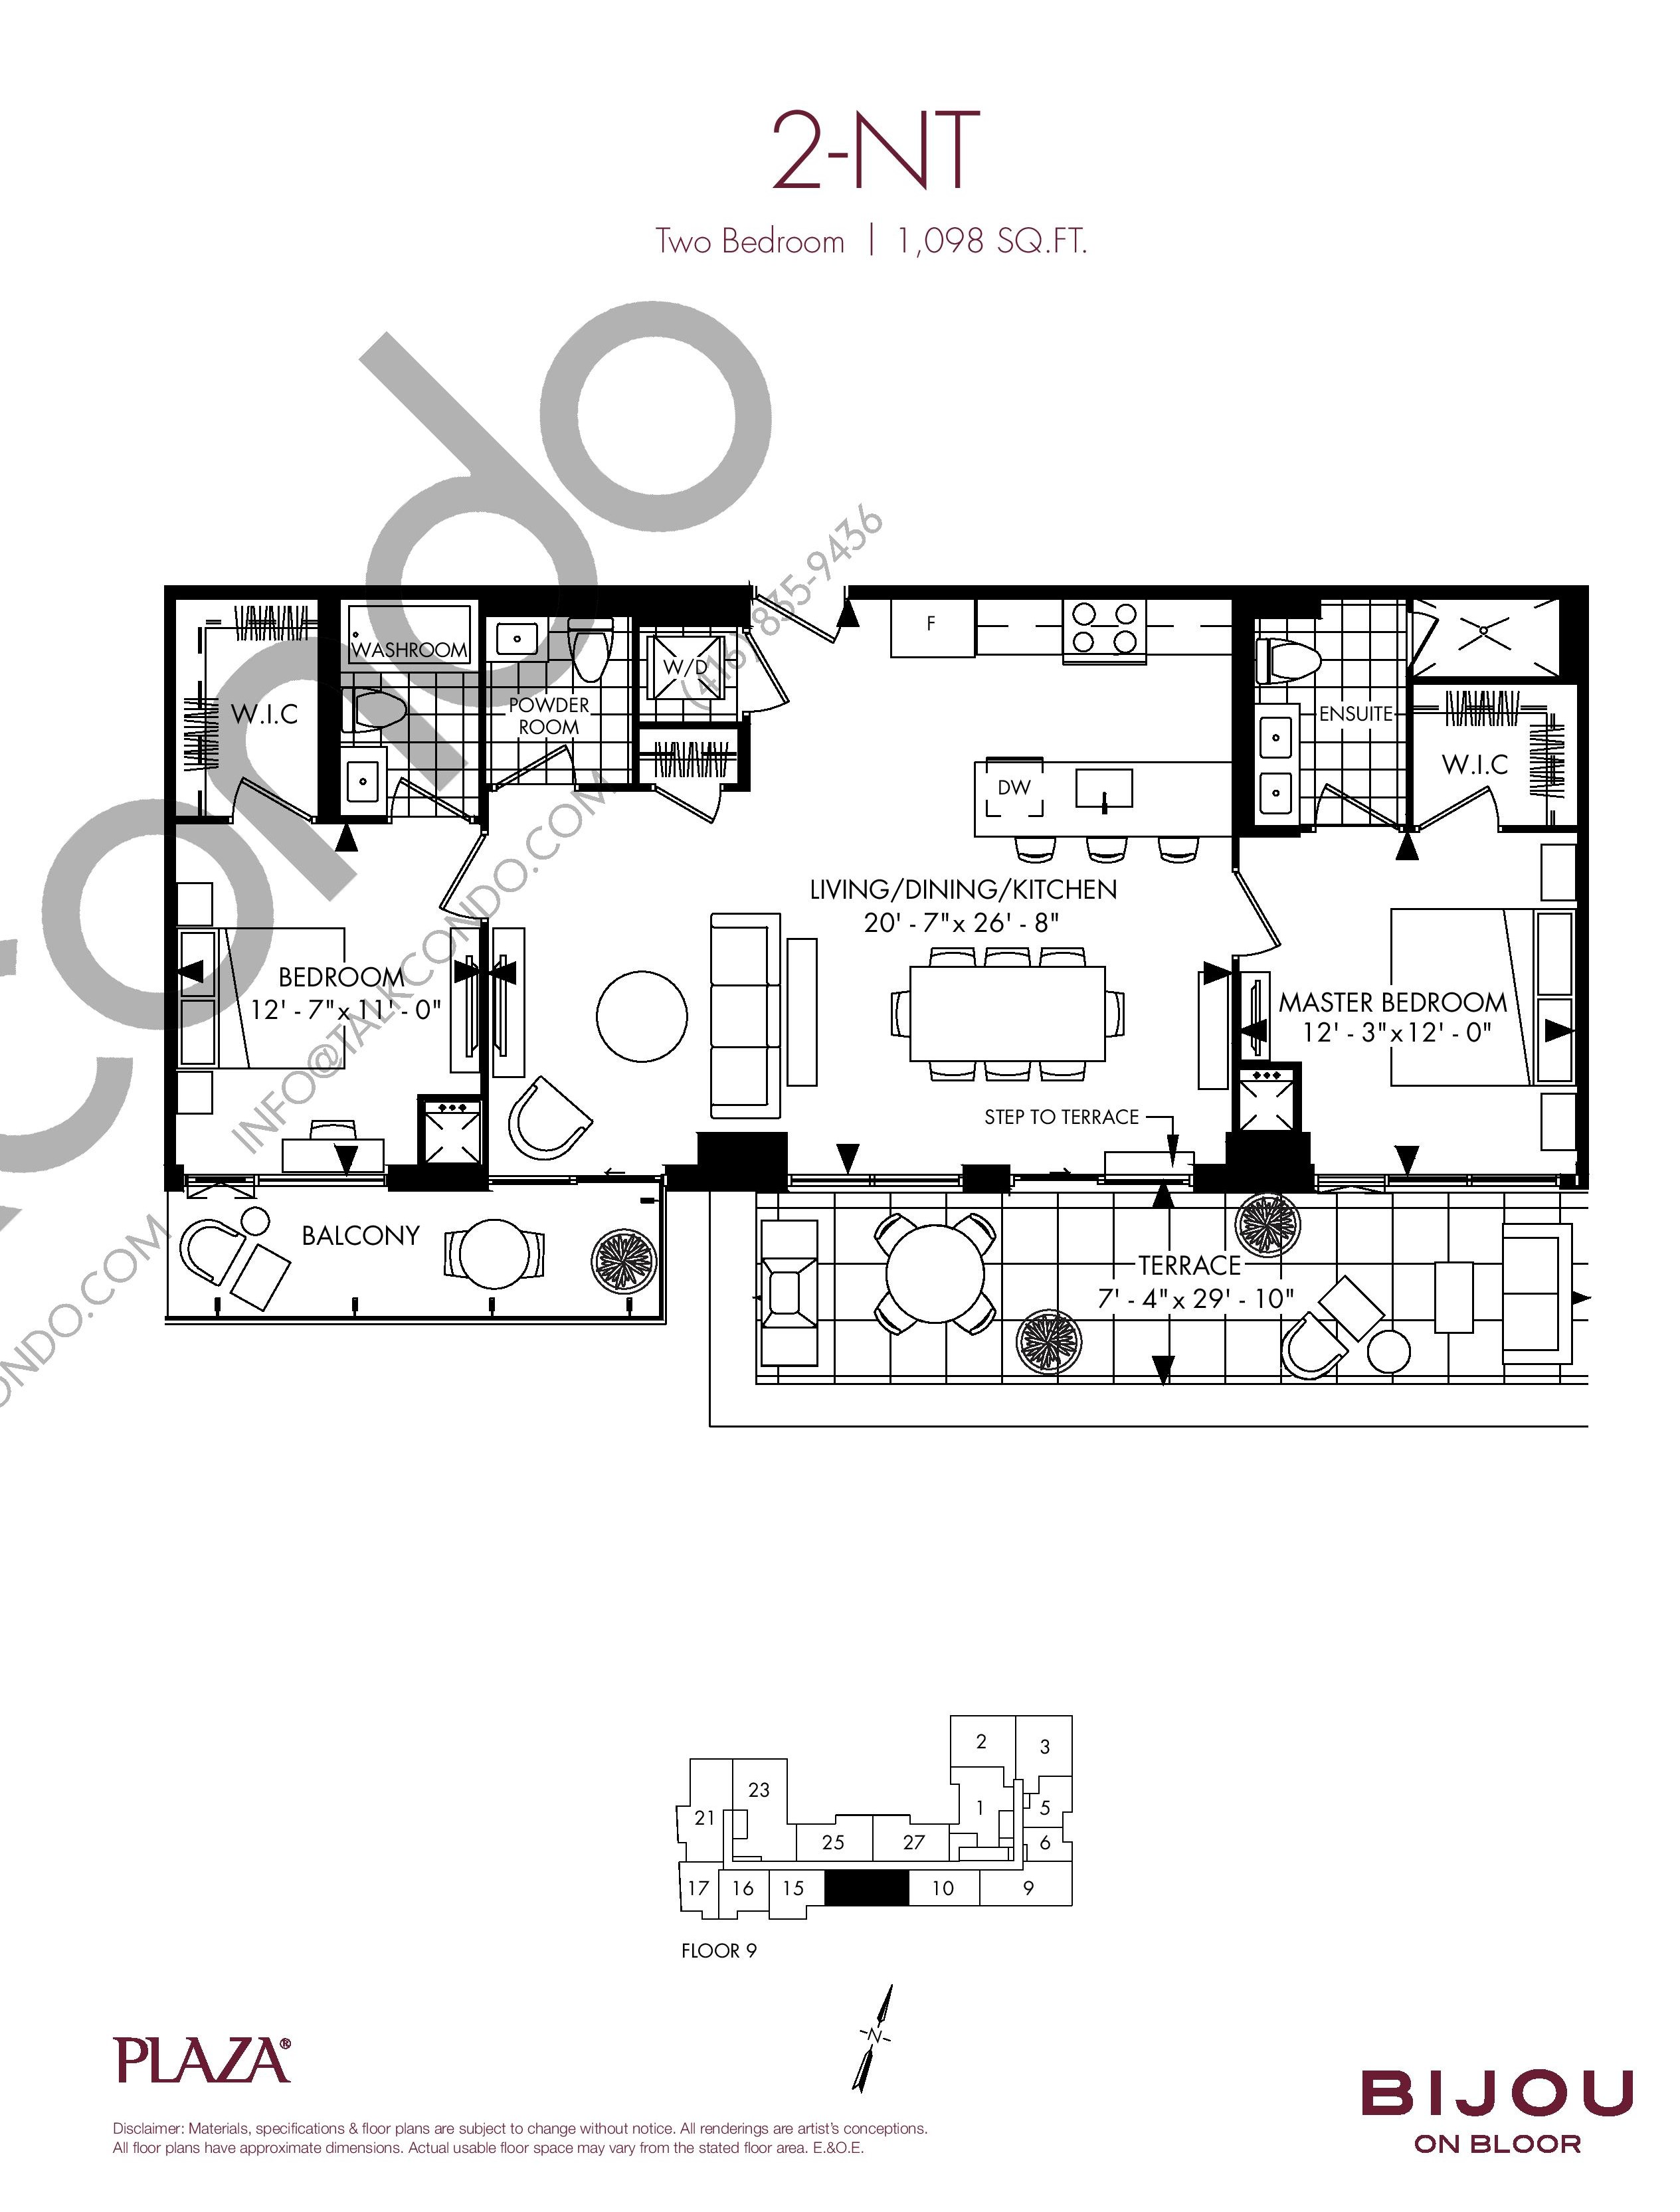 2-NT Floor Plan at Bijou On Bloor Condos - 1098 sq.ft